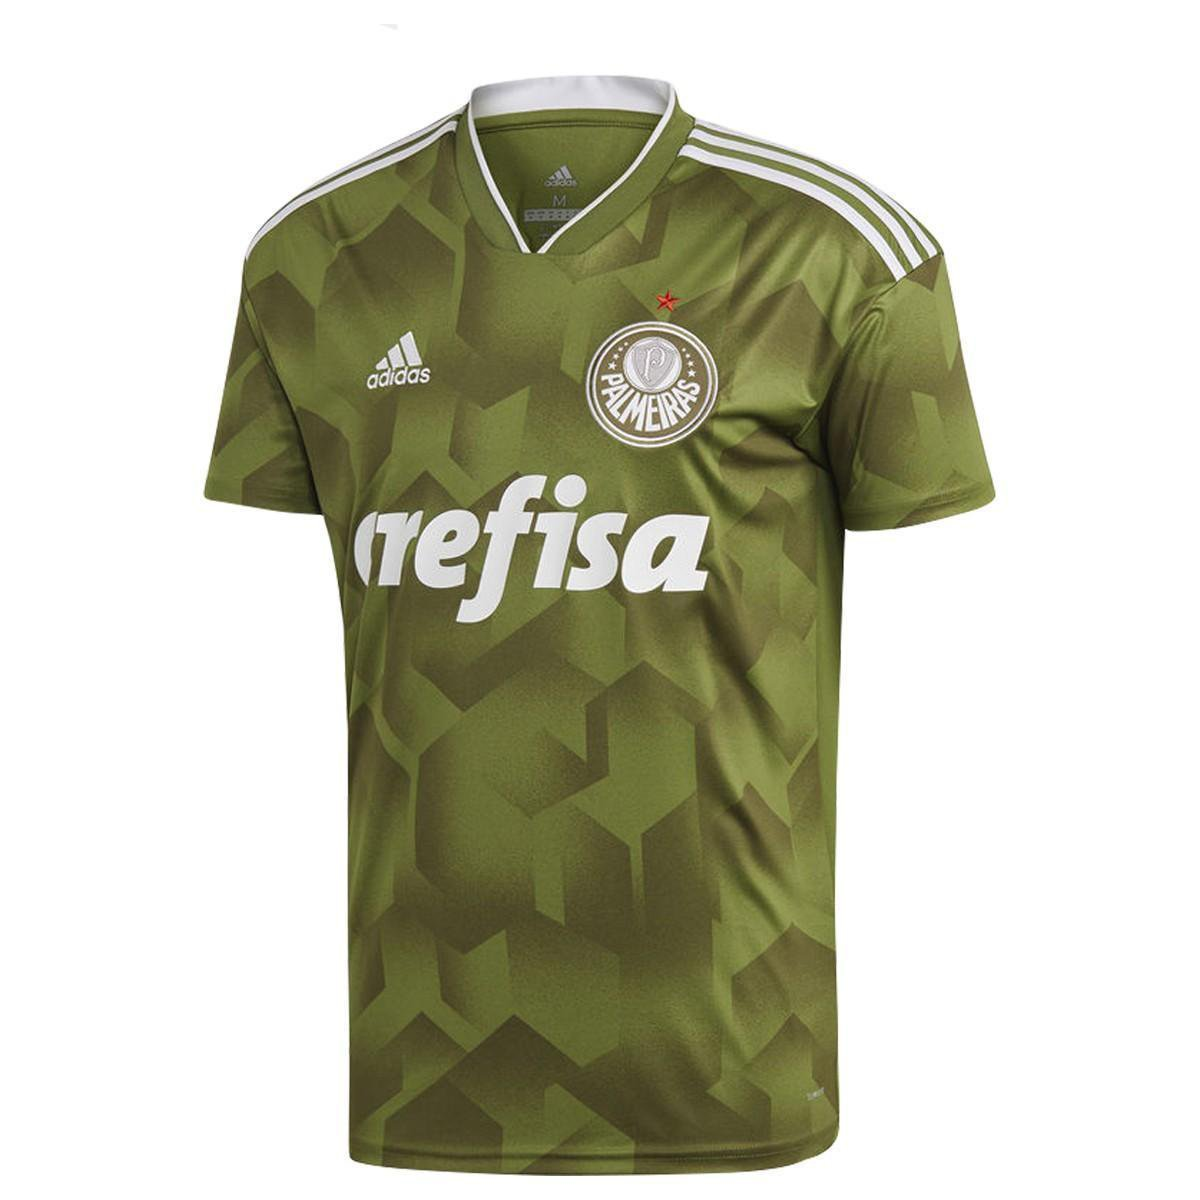 01eddb0f21087 Camisa Palmeiras III 2018 s n° - Torcedor Adidas Masculina - Verde - Compre  Agora